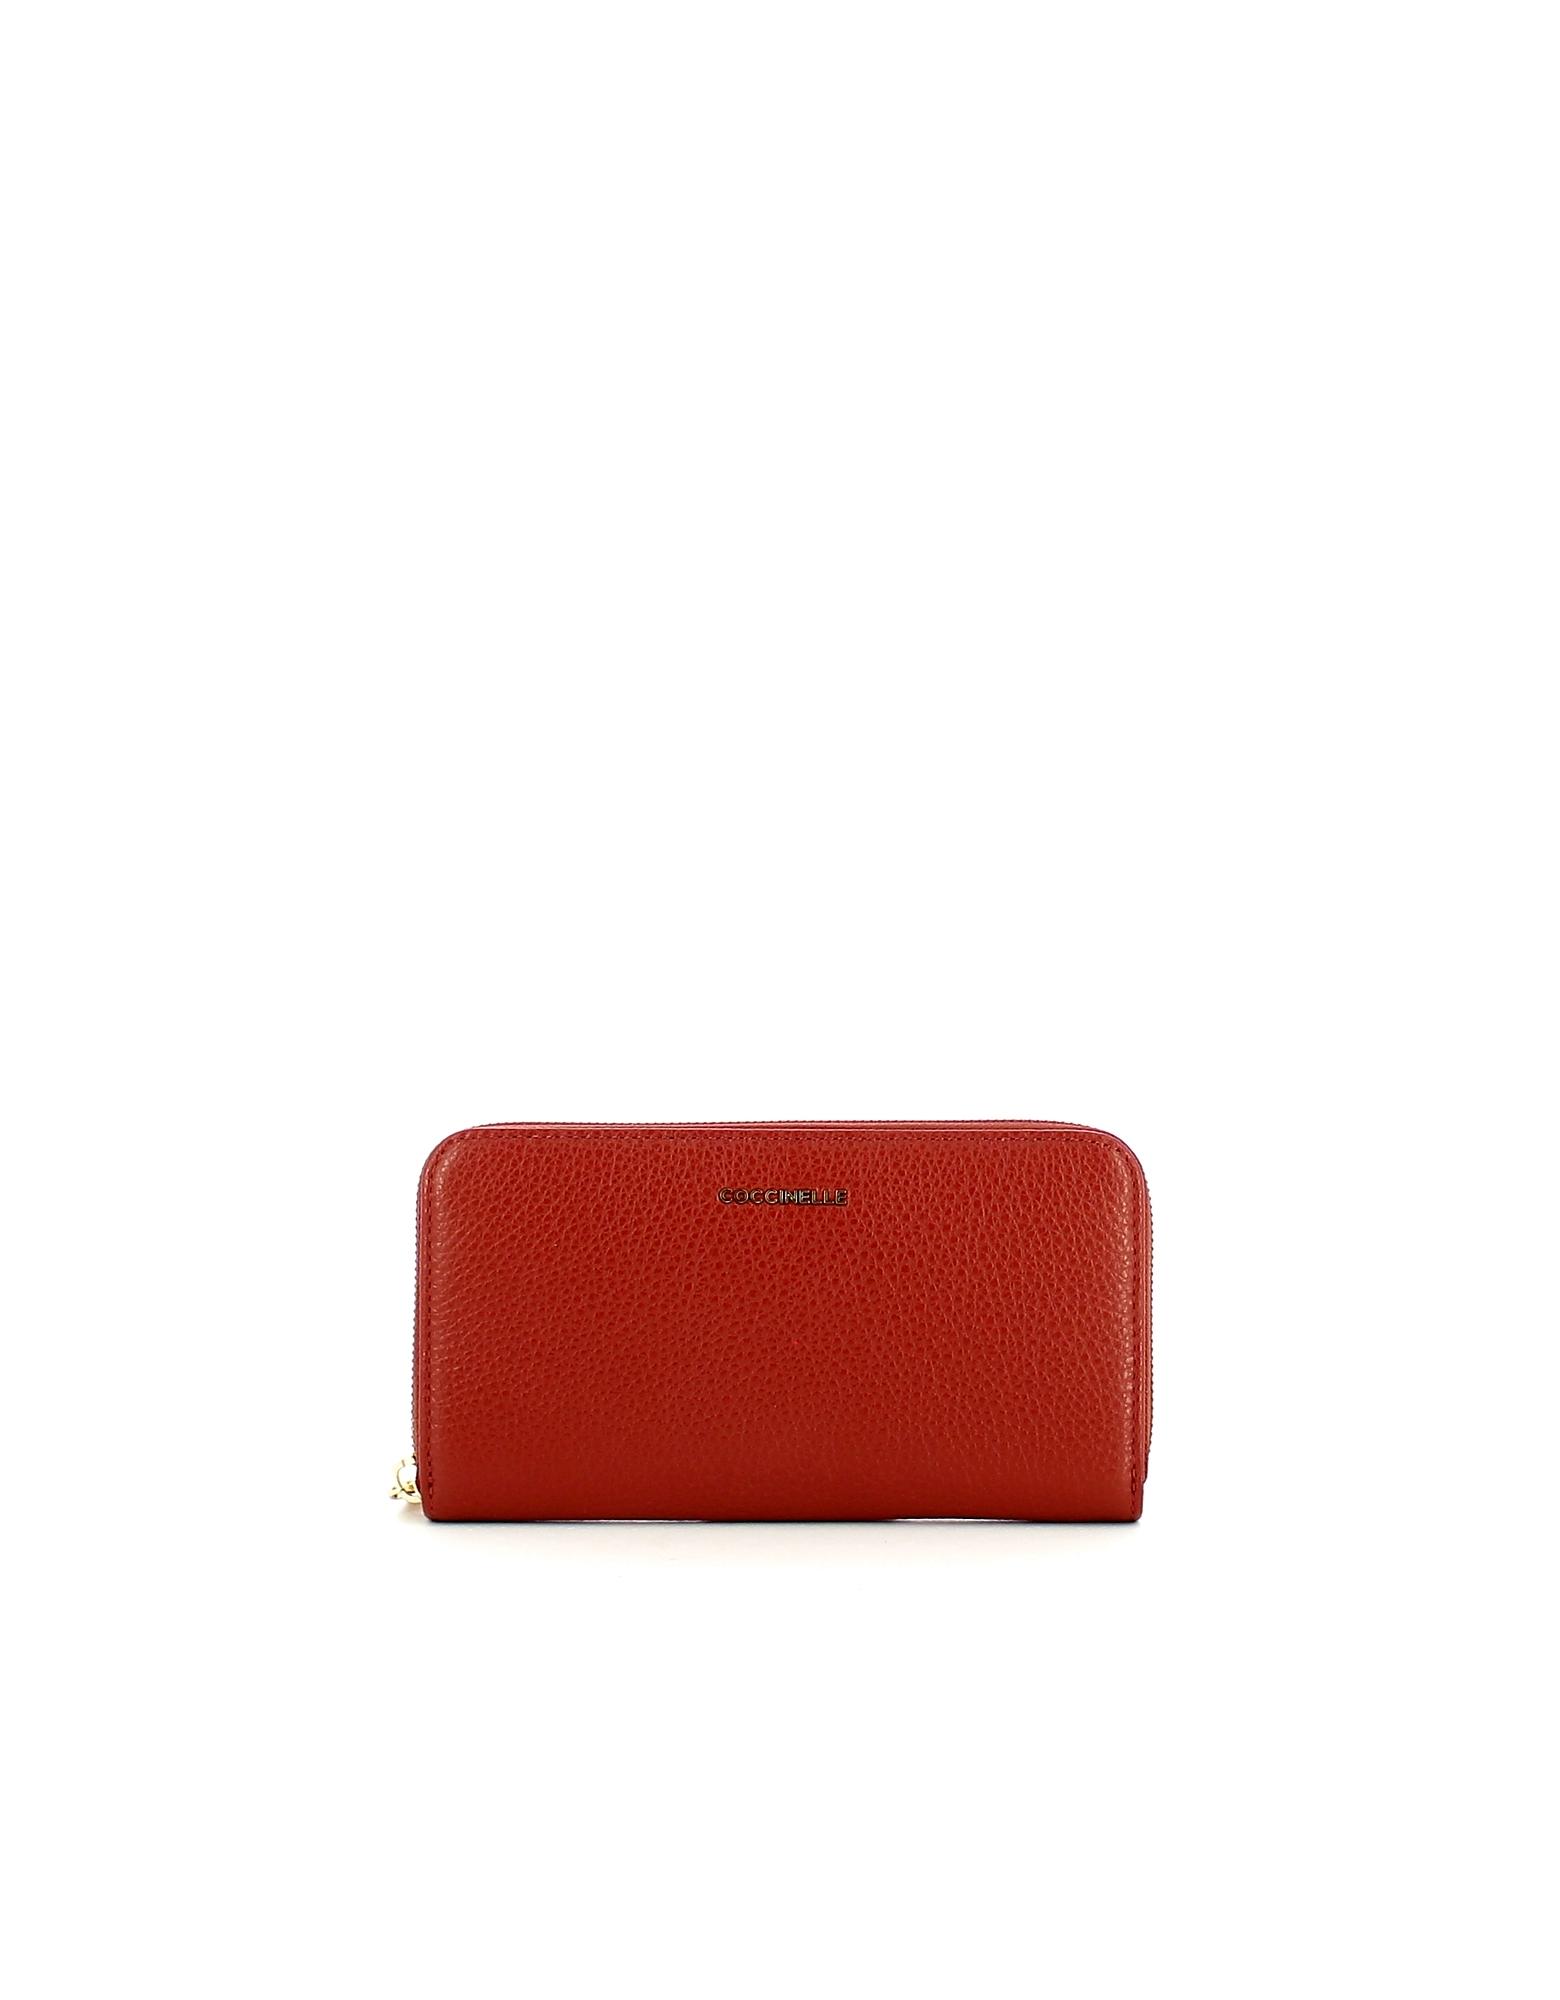 Coccinelle Designer Wallets, Women's Red Wallet